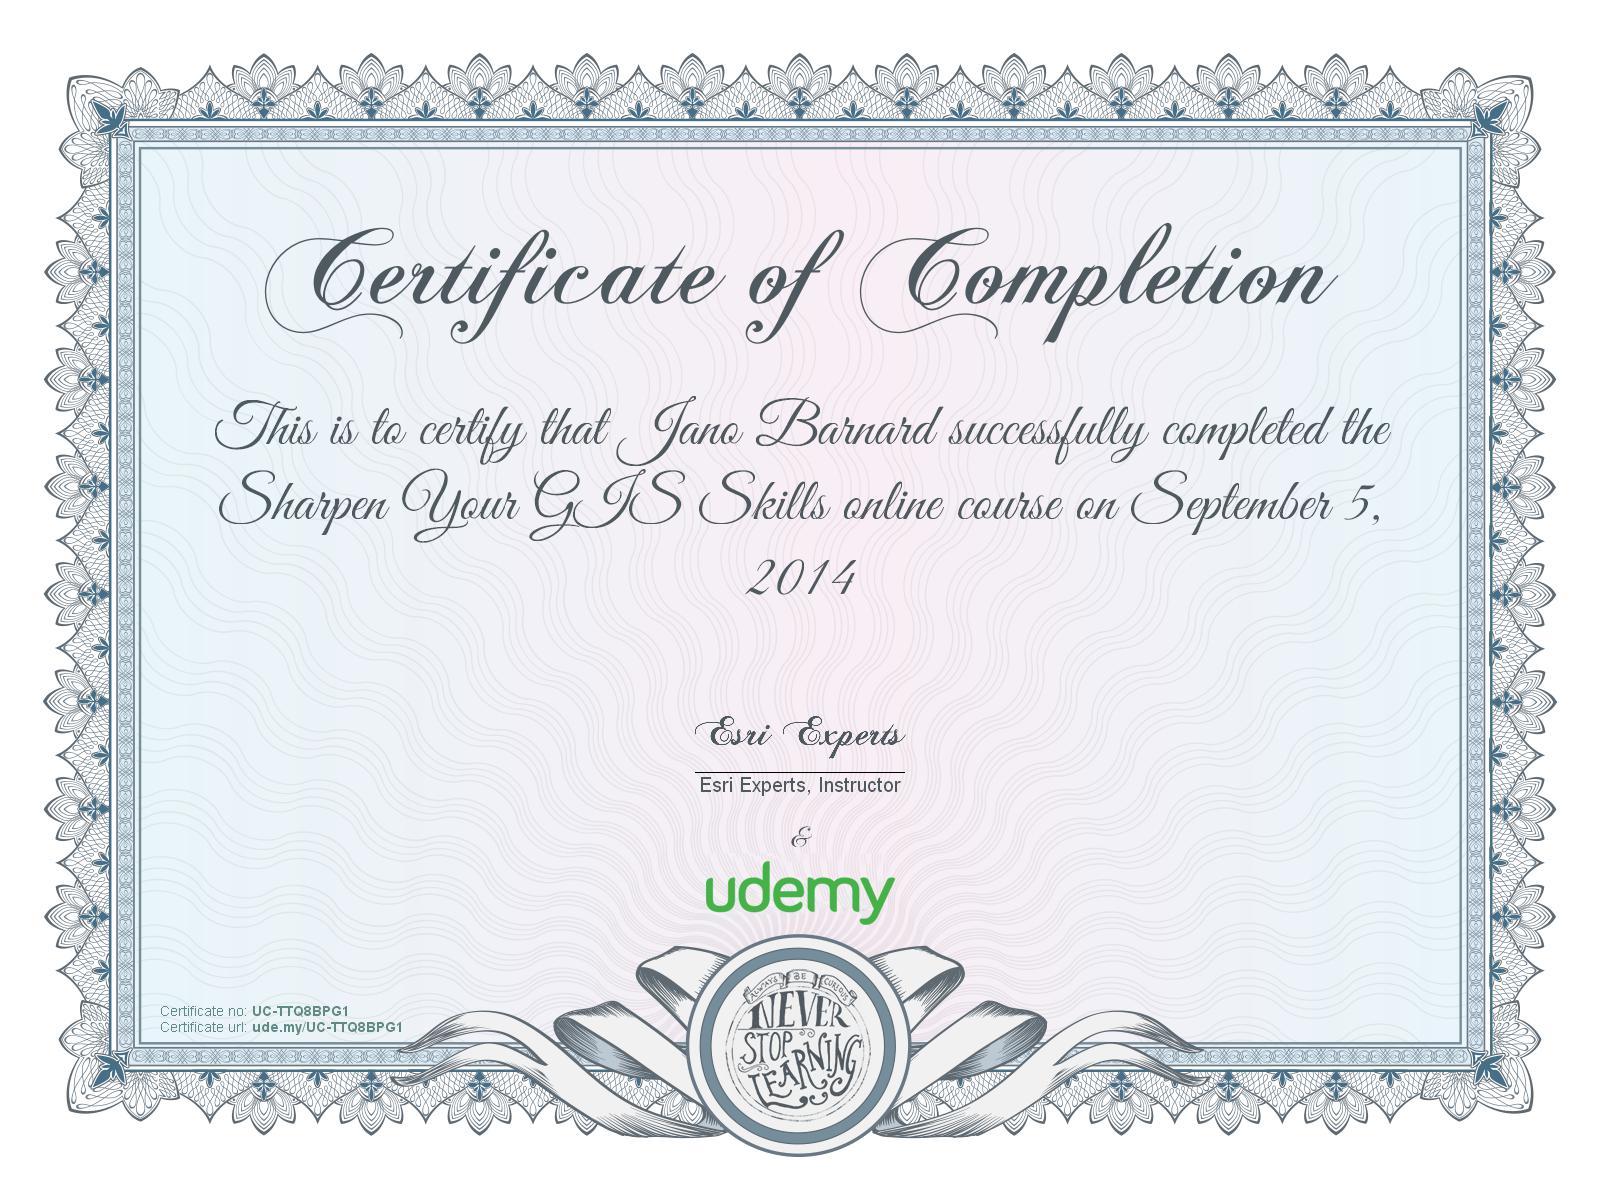 Certificates Jano Barnard